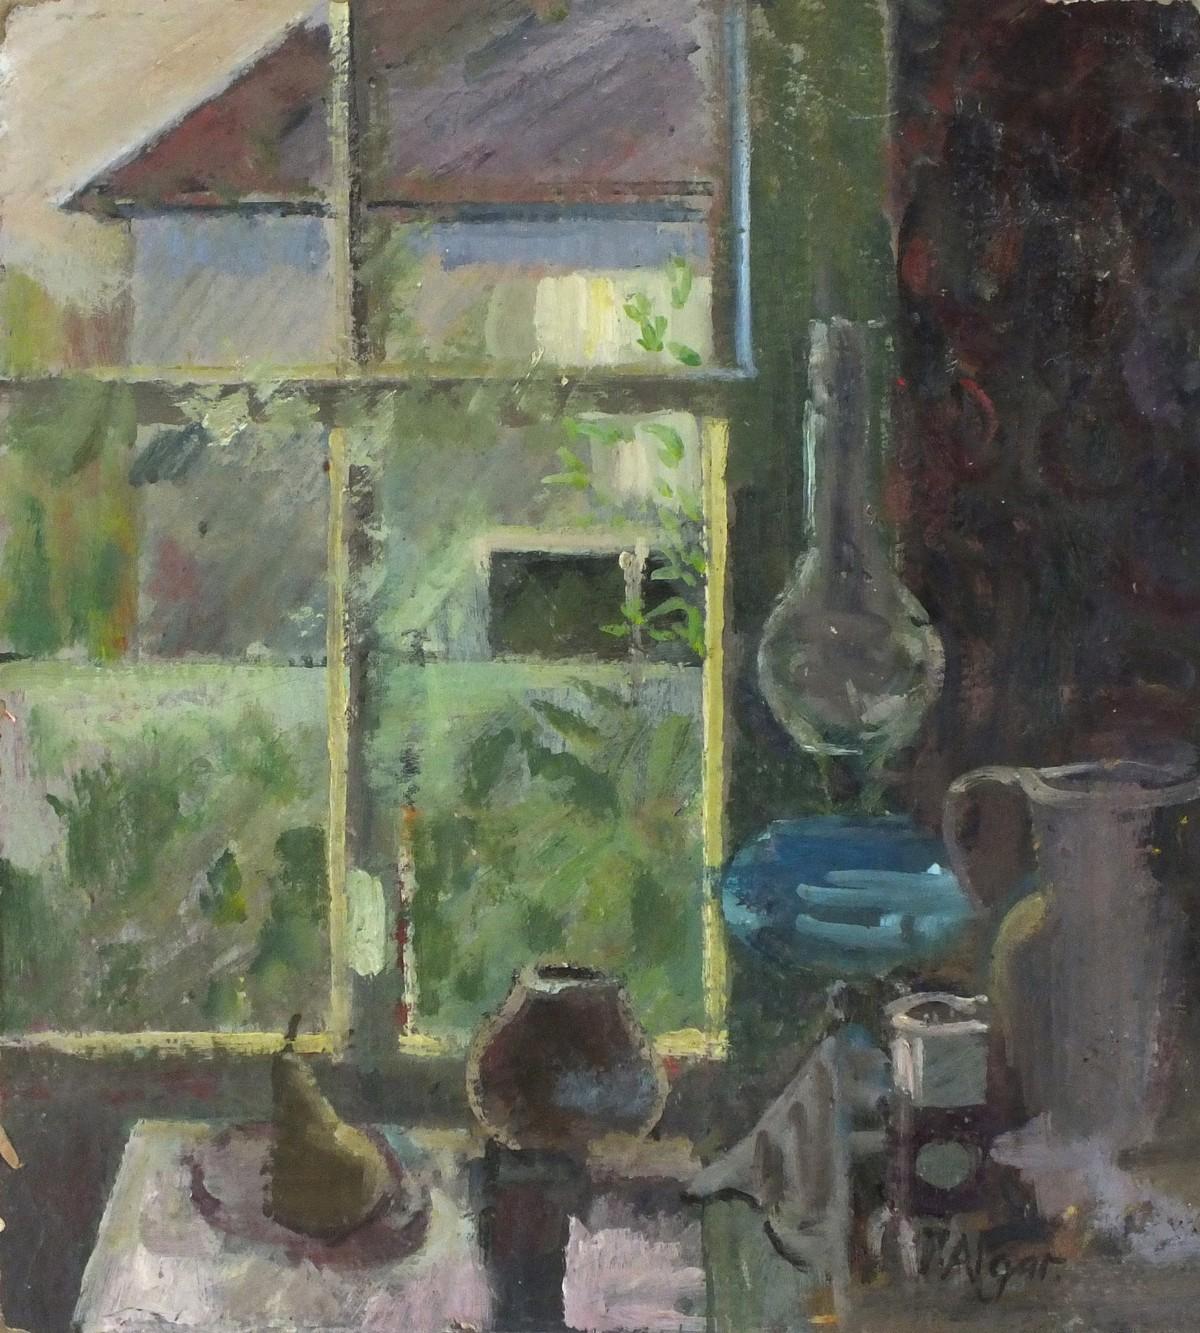 Lot 46 - Pat ALGAR (1937-2013), Oil on board, Still life - kitchen assortment & oil lamp before a window,